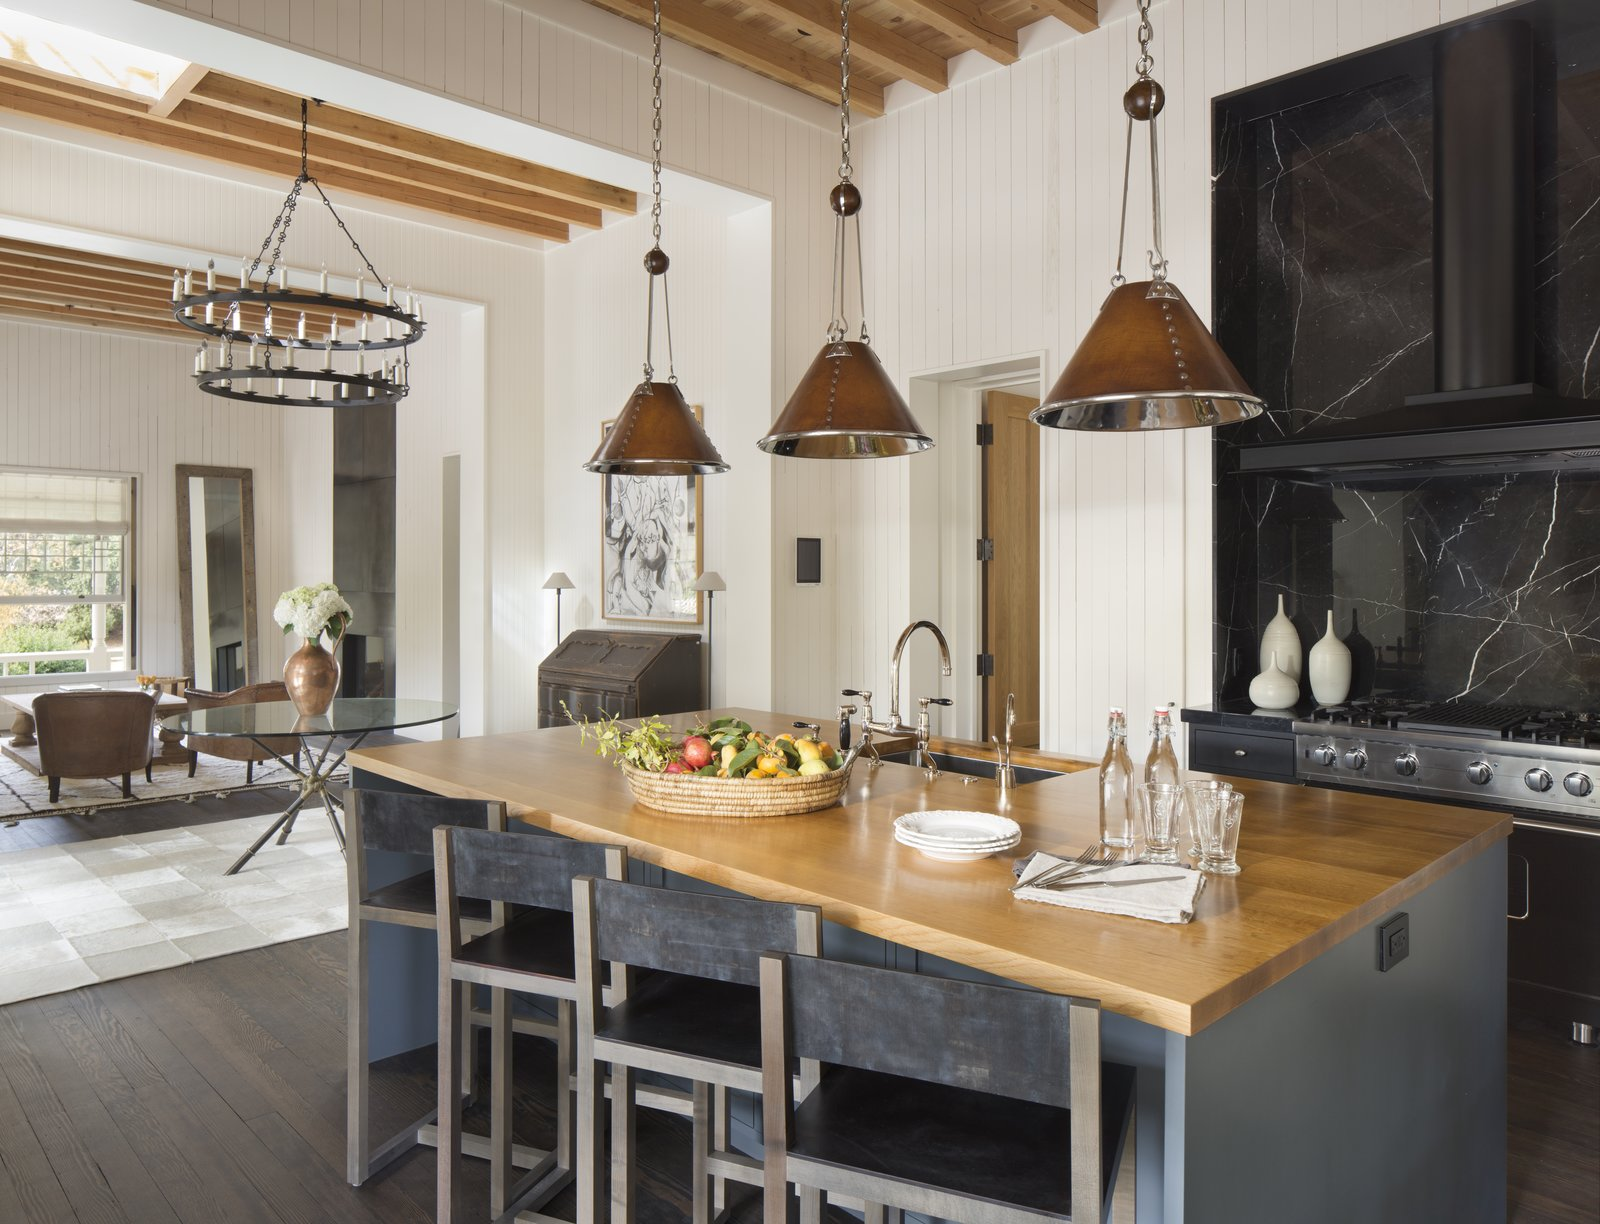 Kitchen Cole House  Cole House by Richard Beard Architects